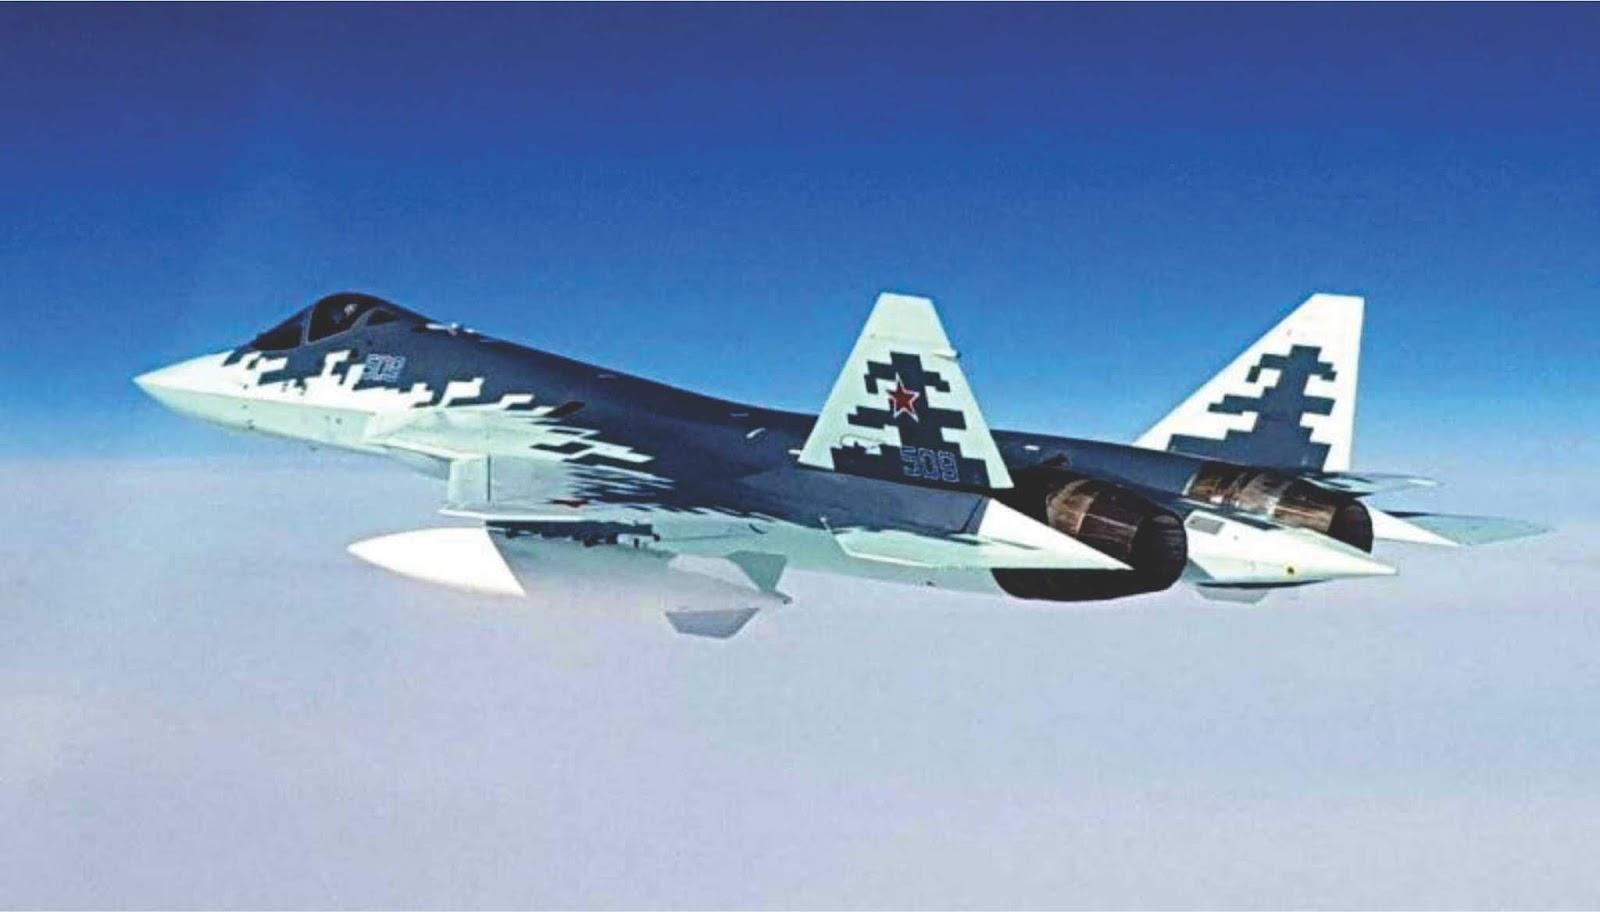 Mengapa ? Ini tentang Pesawat Tempur Gen-5 Sukhoi Su-57